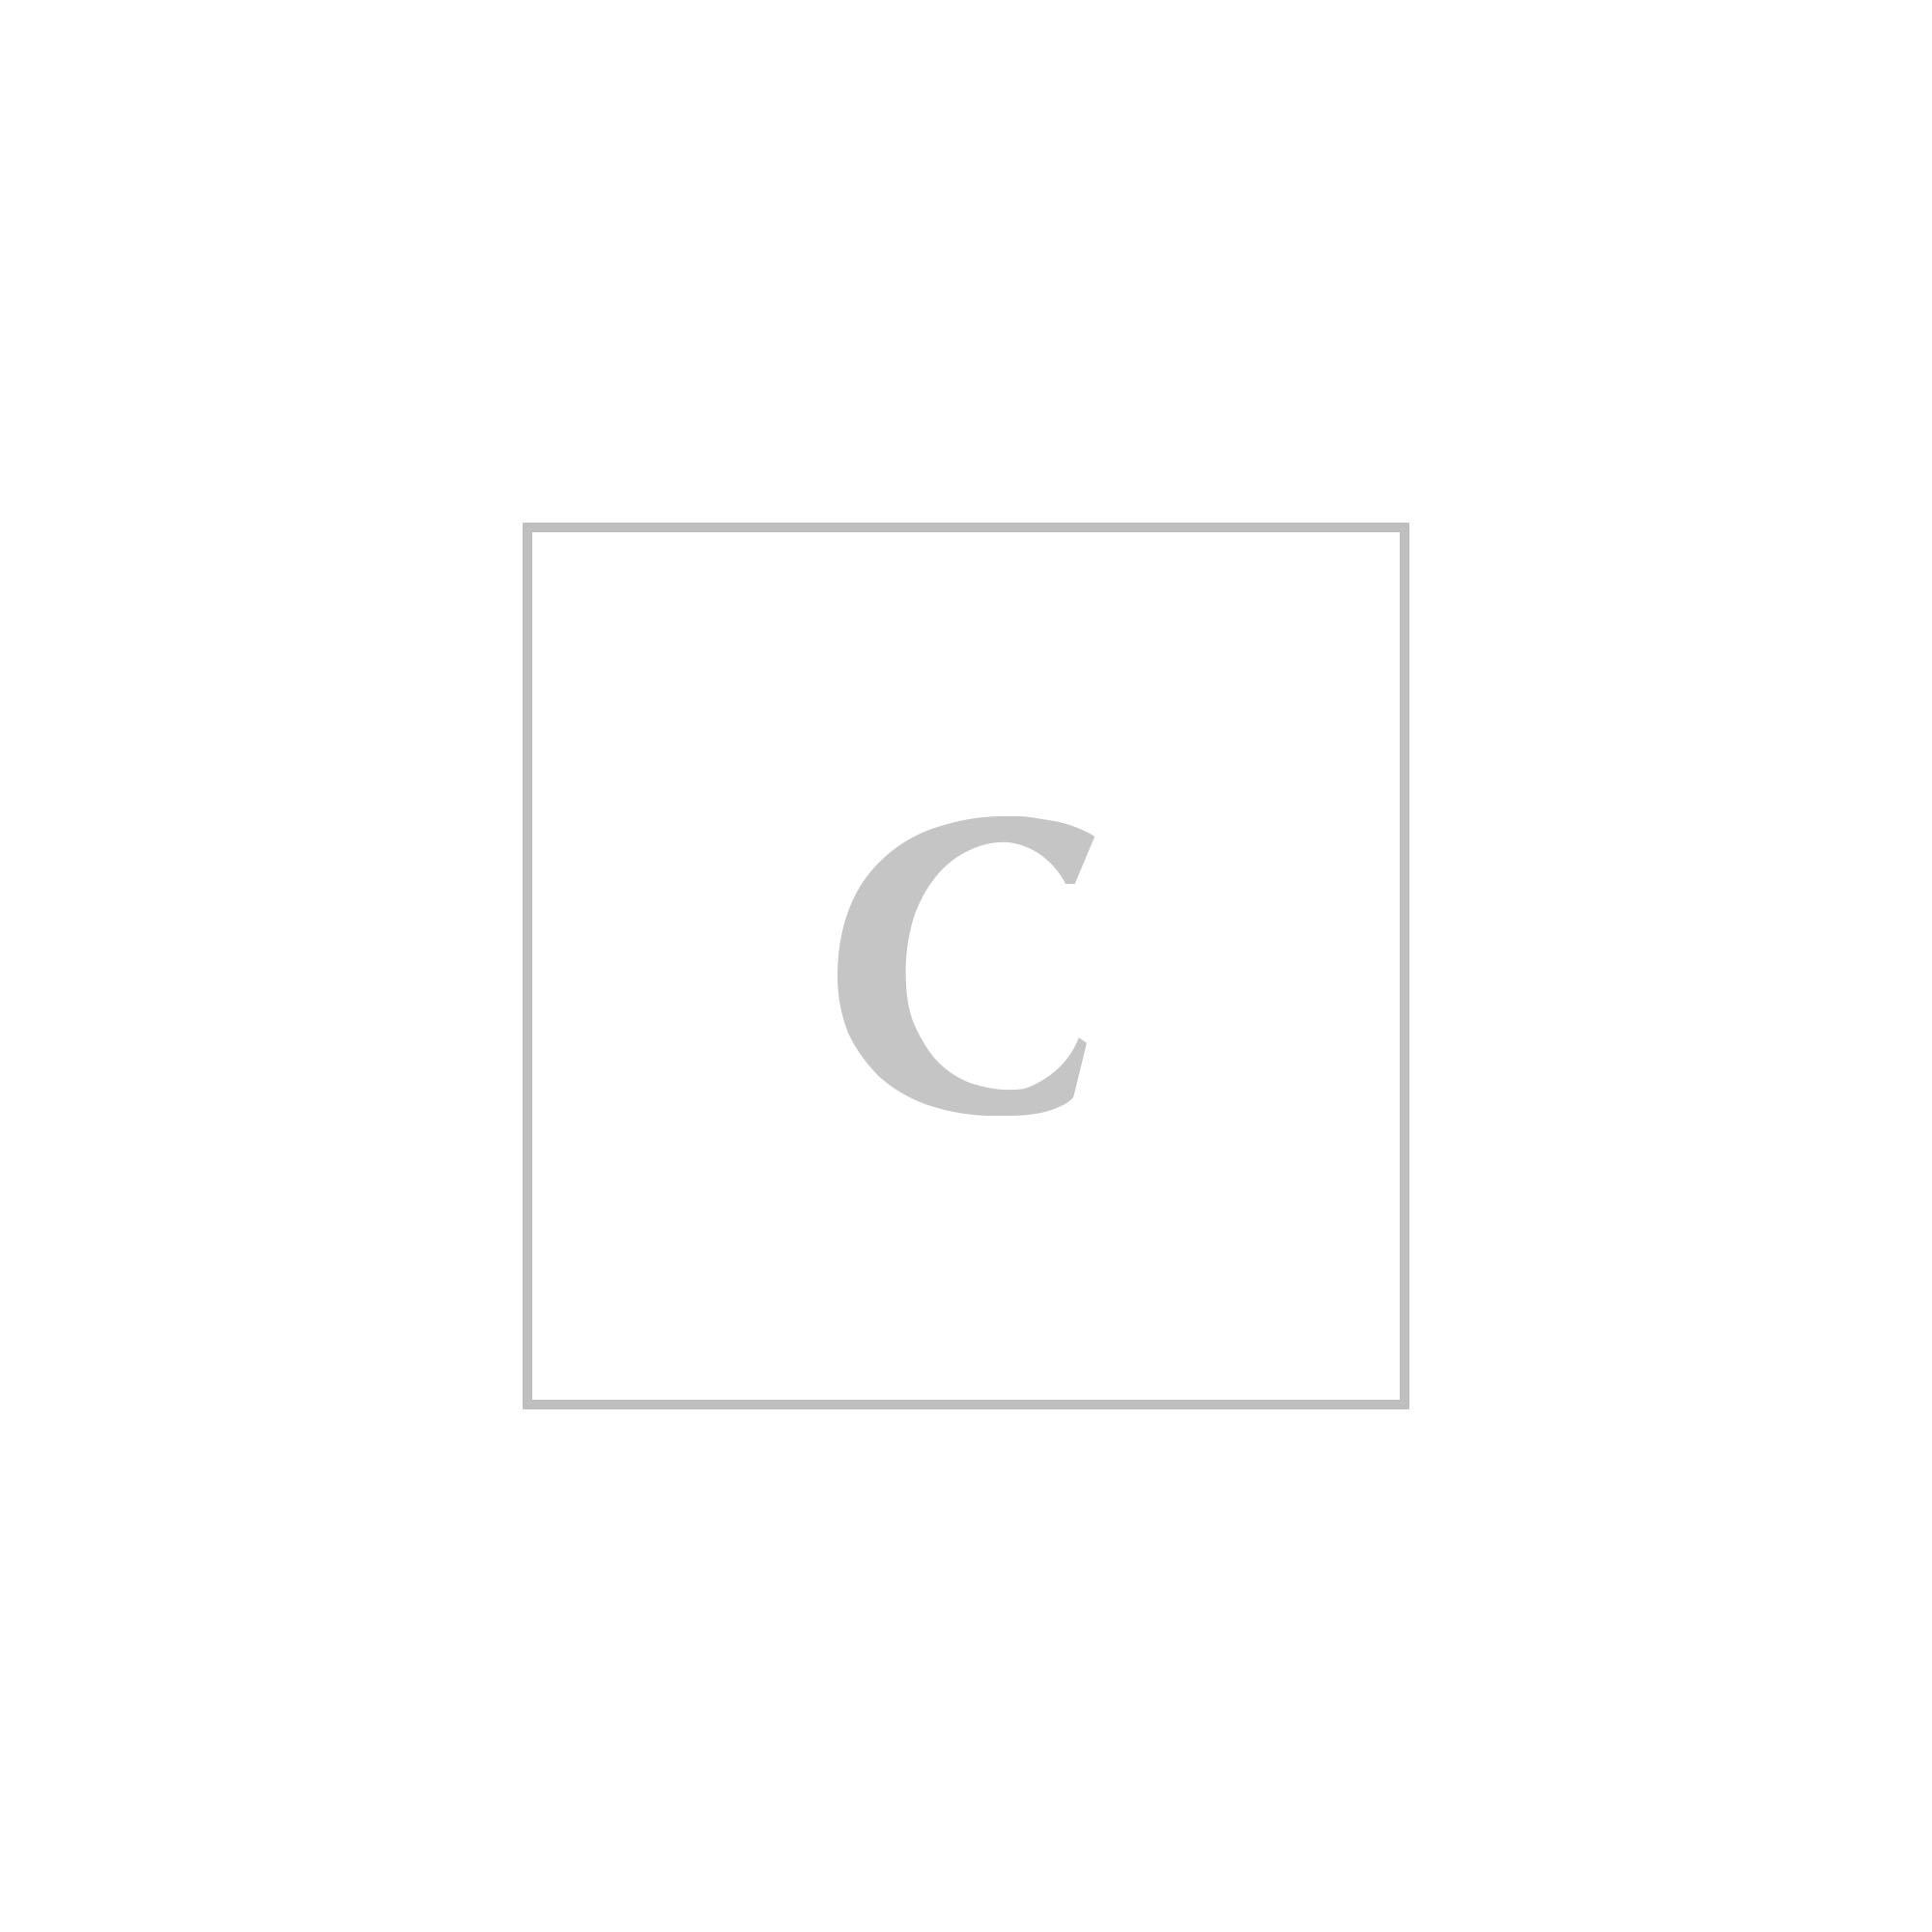 3e425d388e2c7 Off-white zaino diag binder clip ...